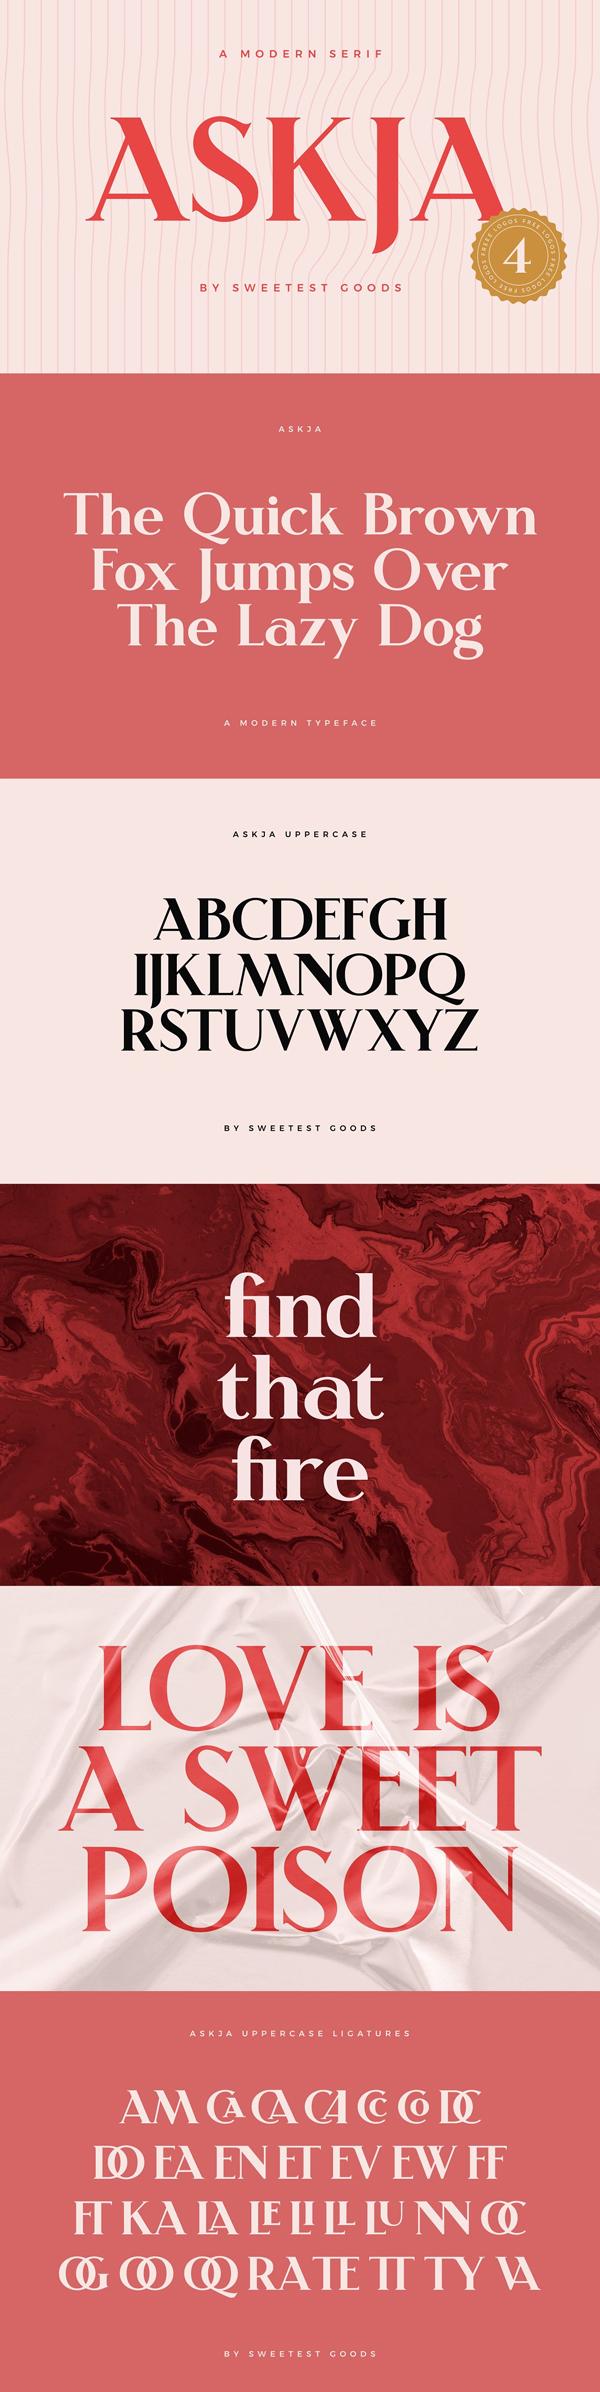 Askja - Modern Font + Free Logos